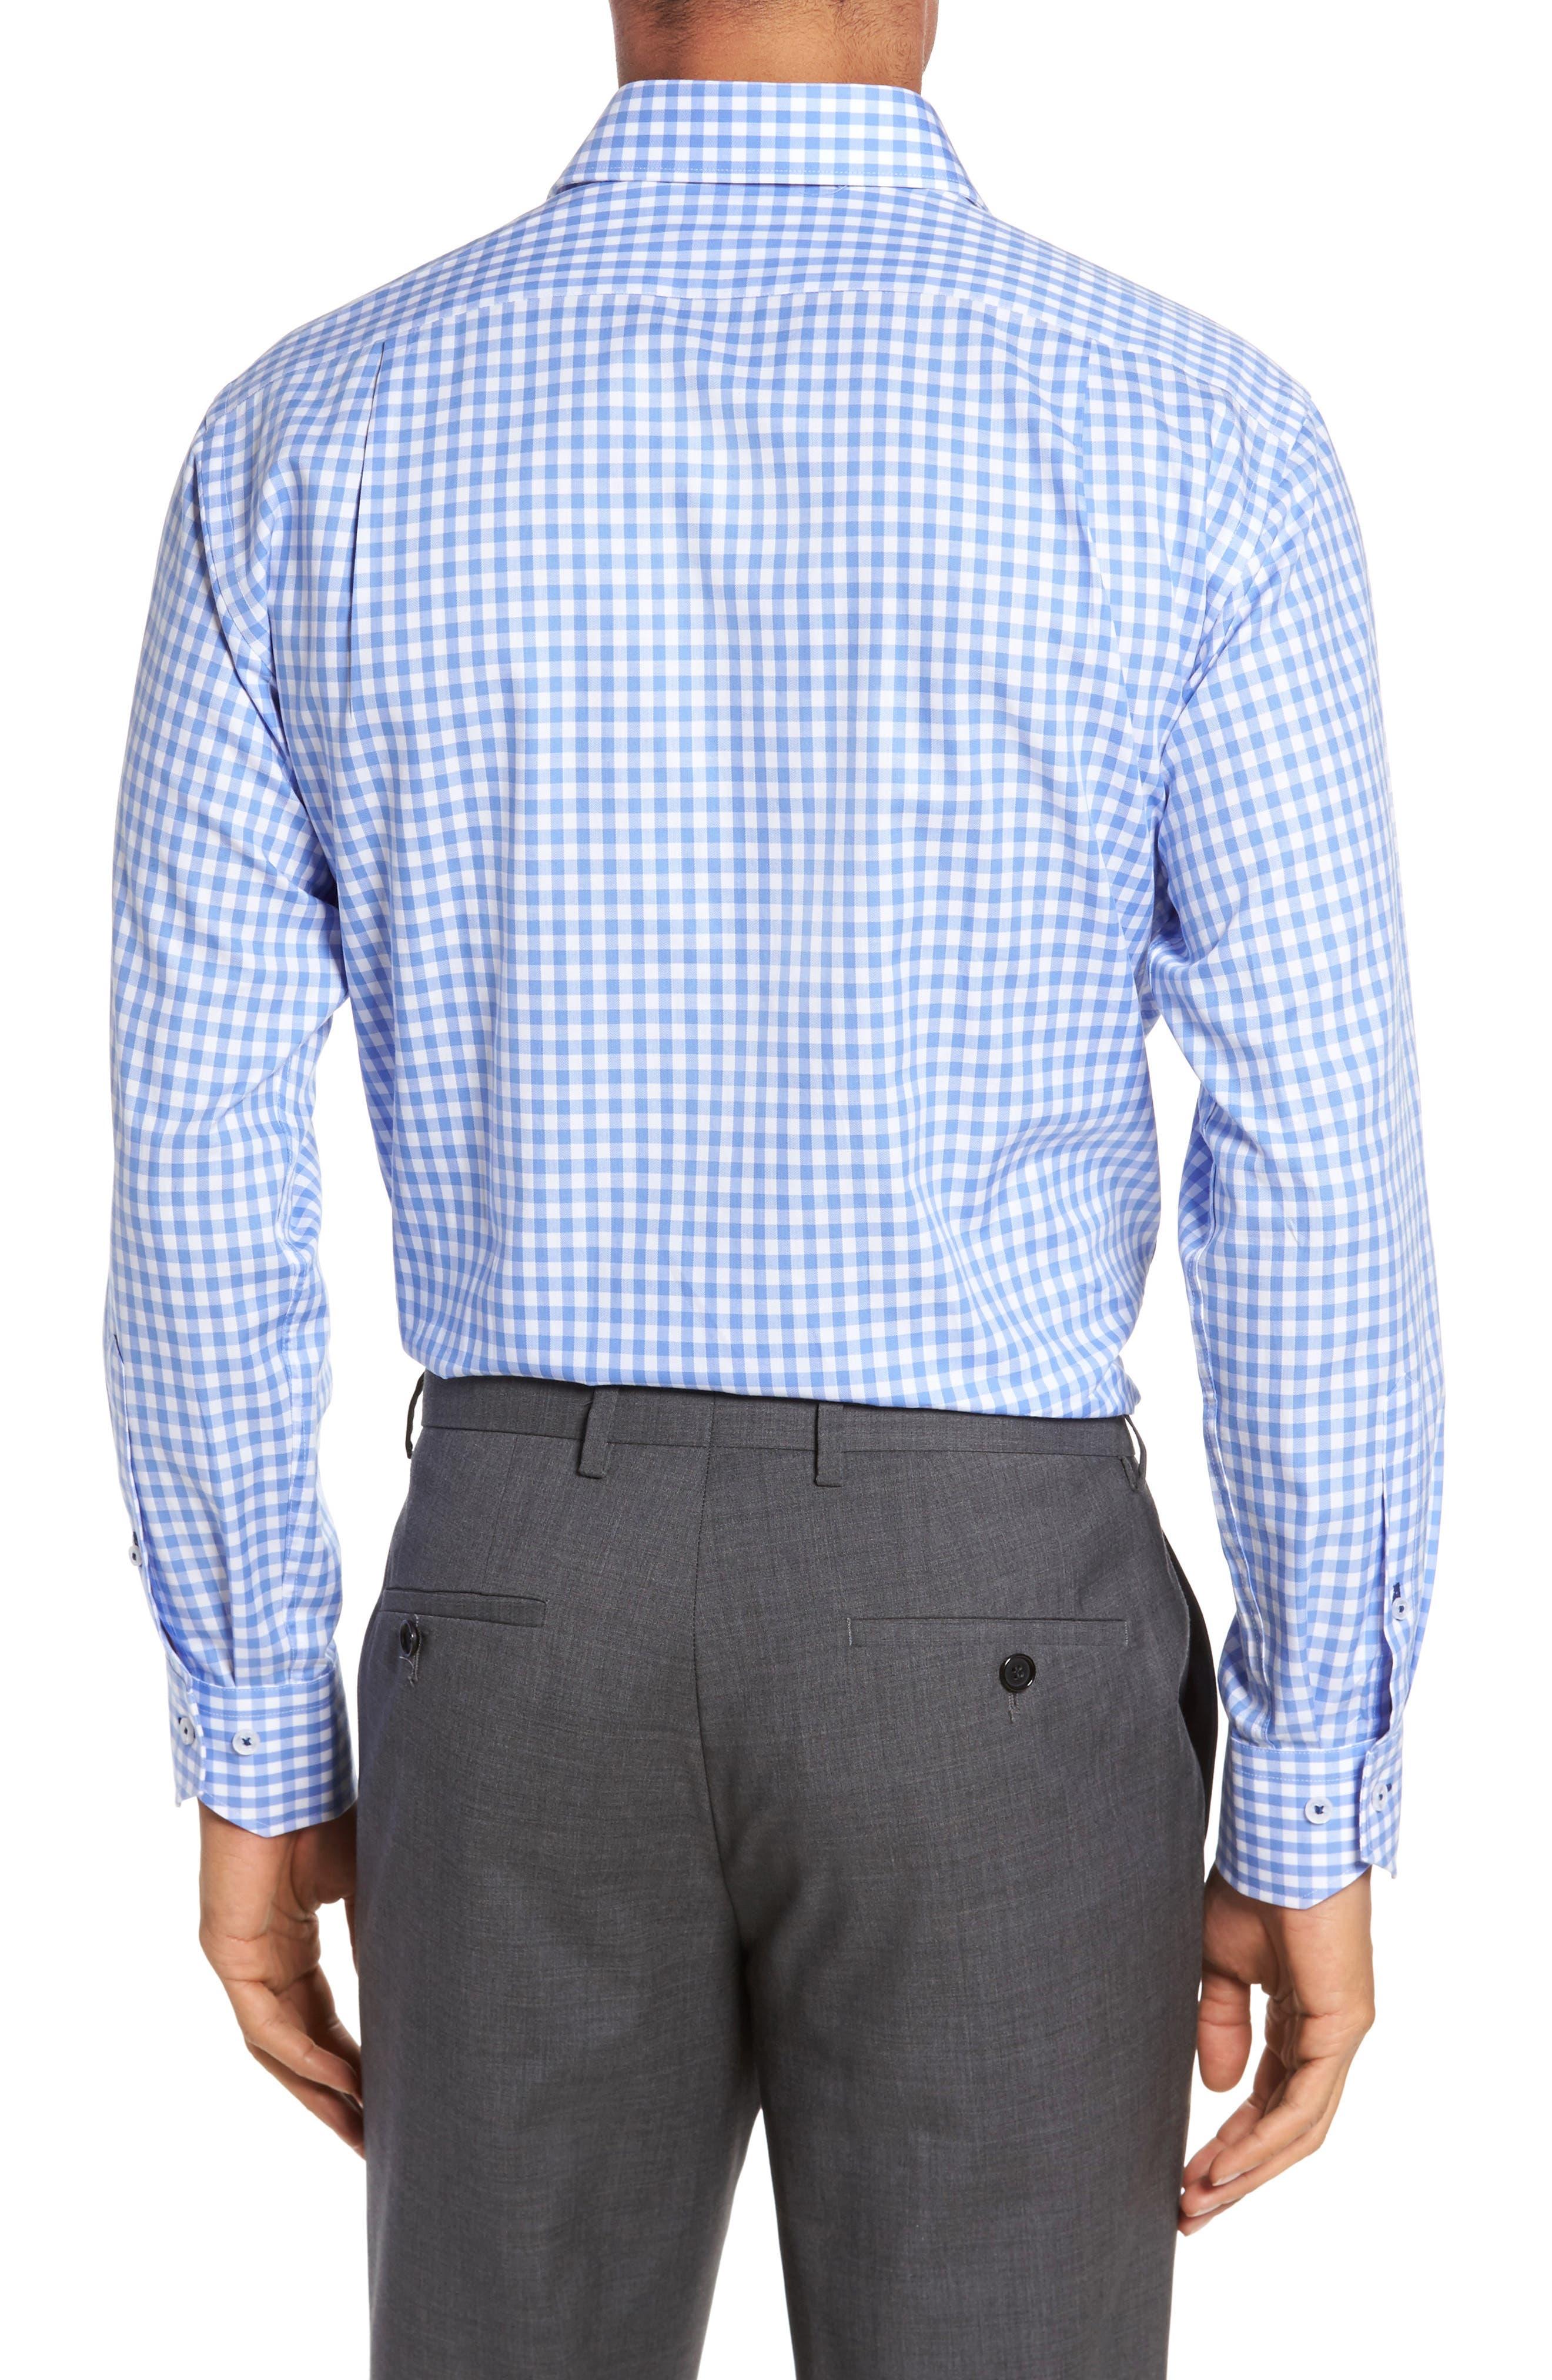 Trim Fit Gingham Dress Shirt,                             Alternate thumbnail 2, color,                             Light Blue